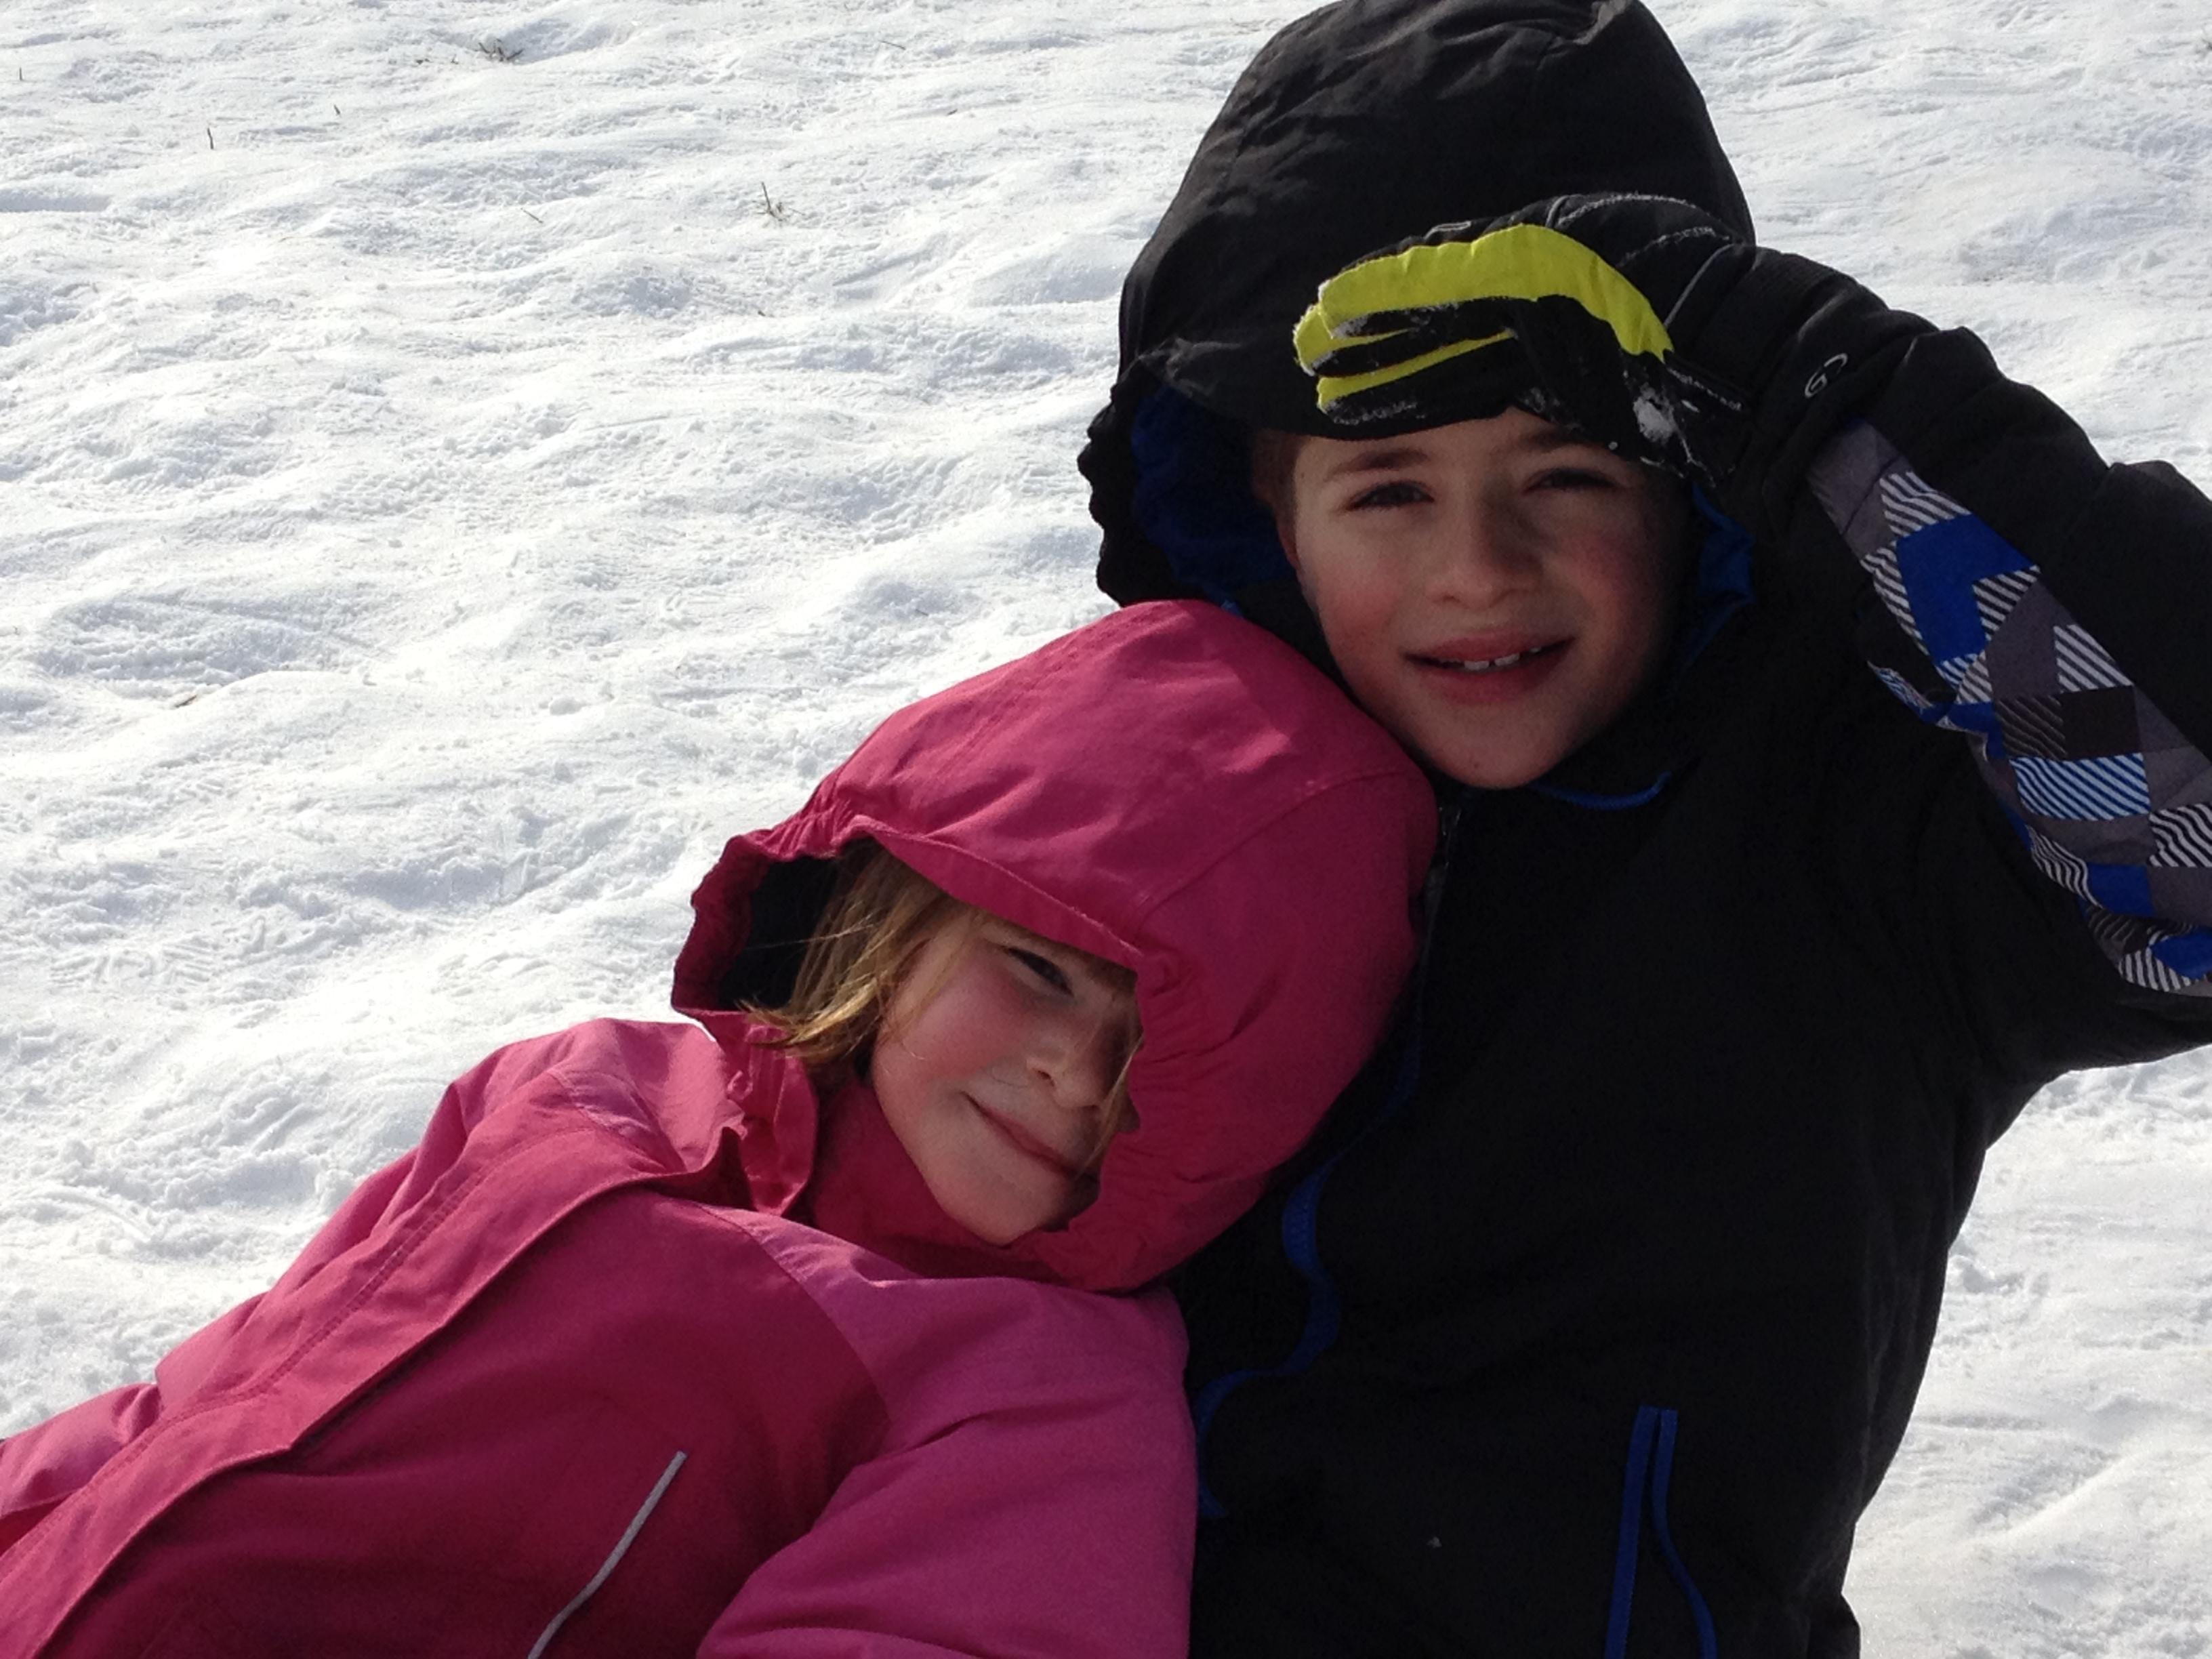 Joey and Rose sledding